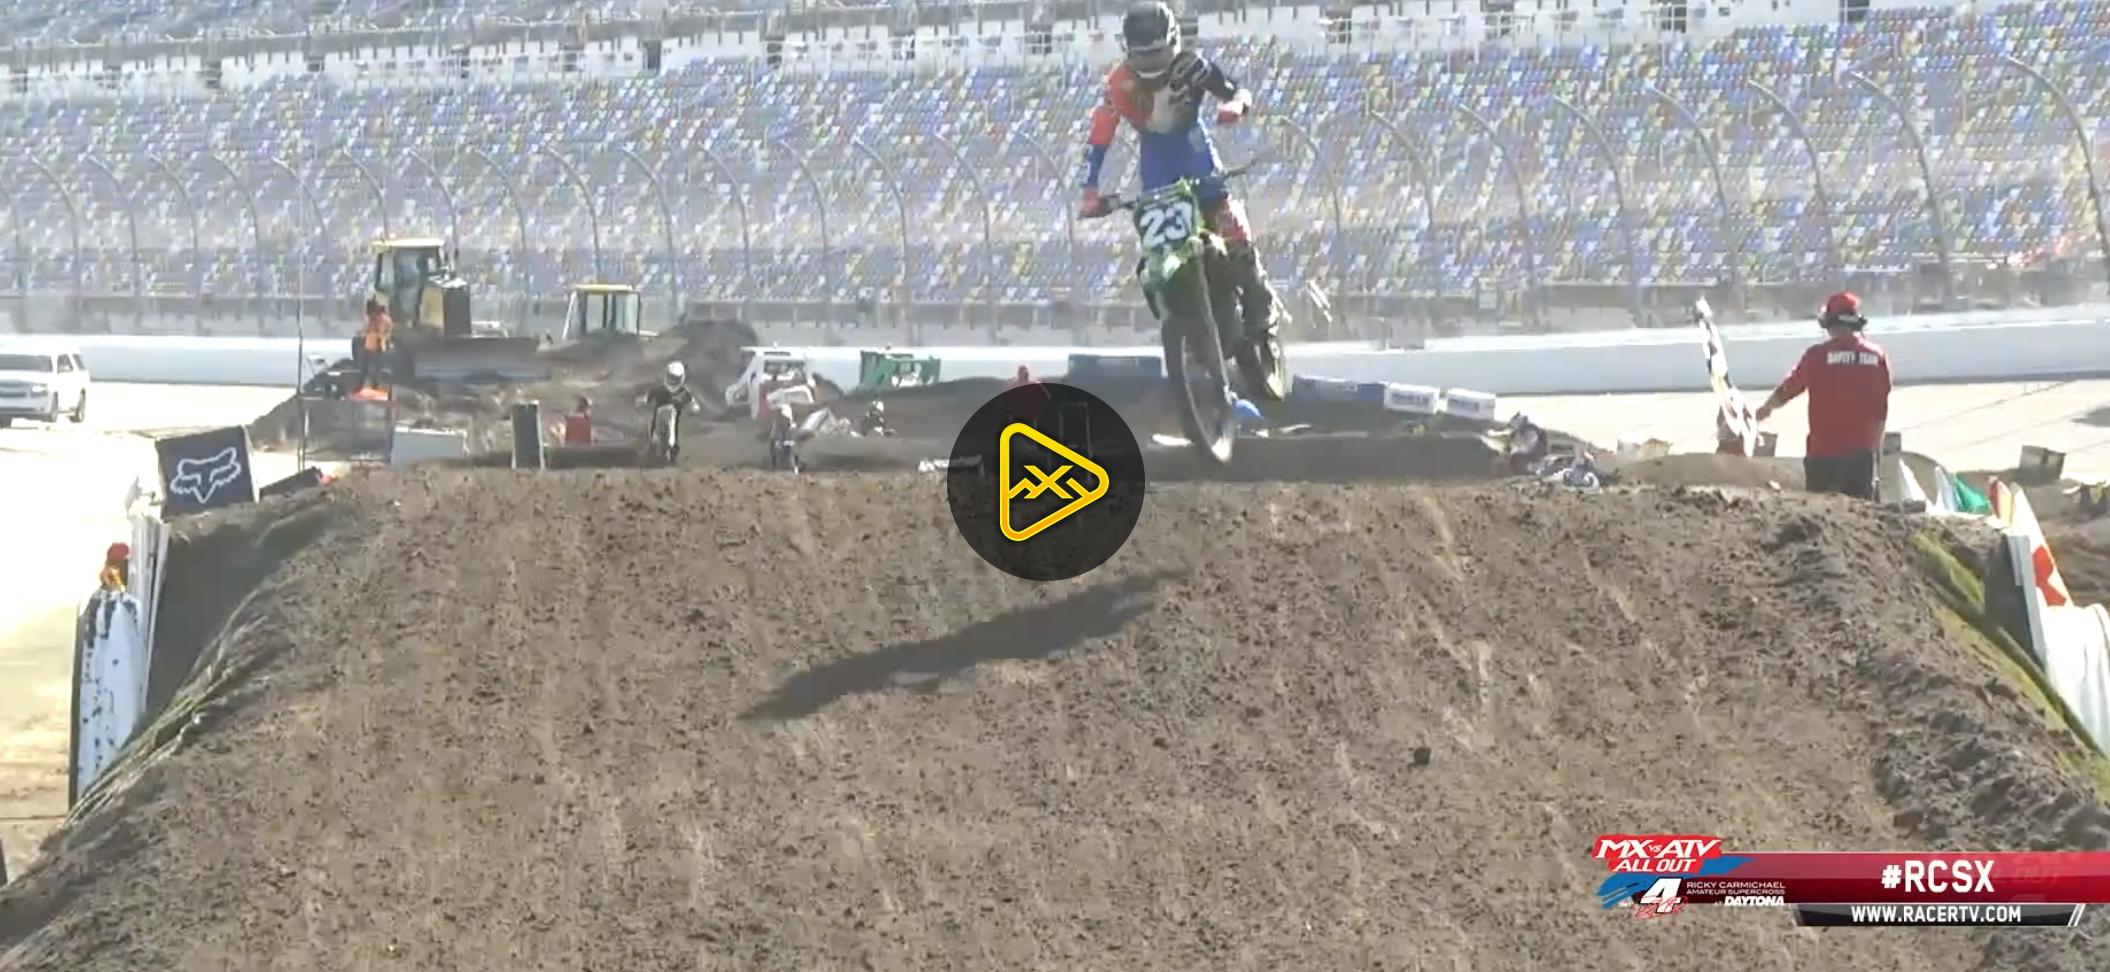 Watch RCSX 2020 Daytona Amateur SX Live